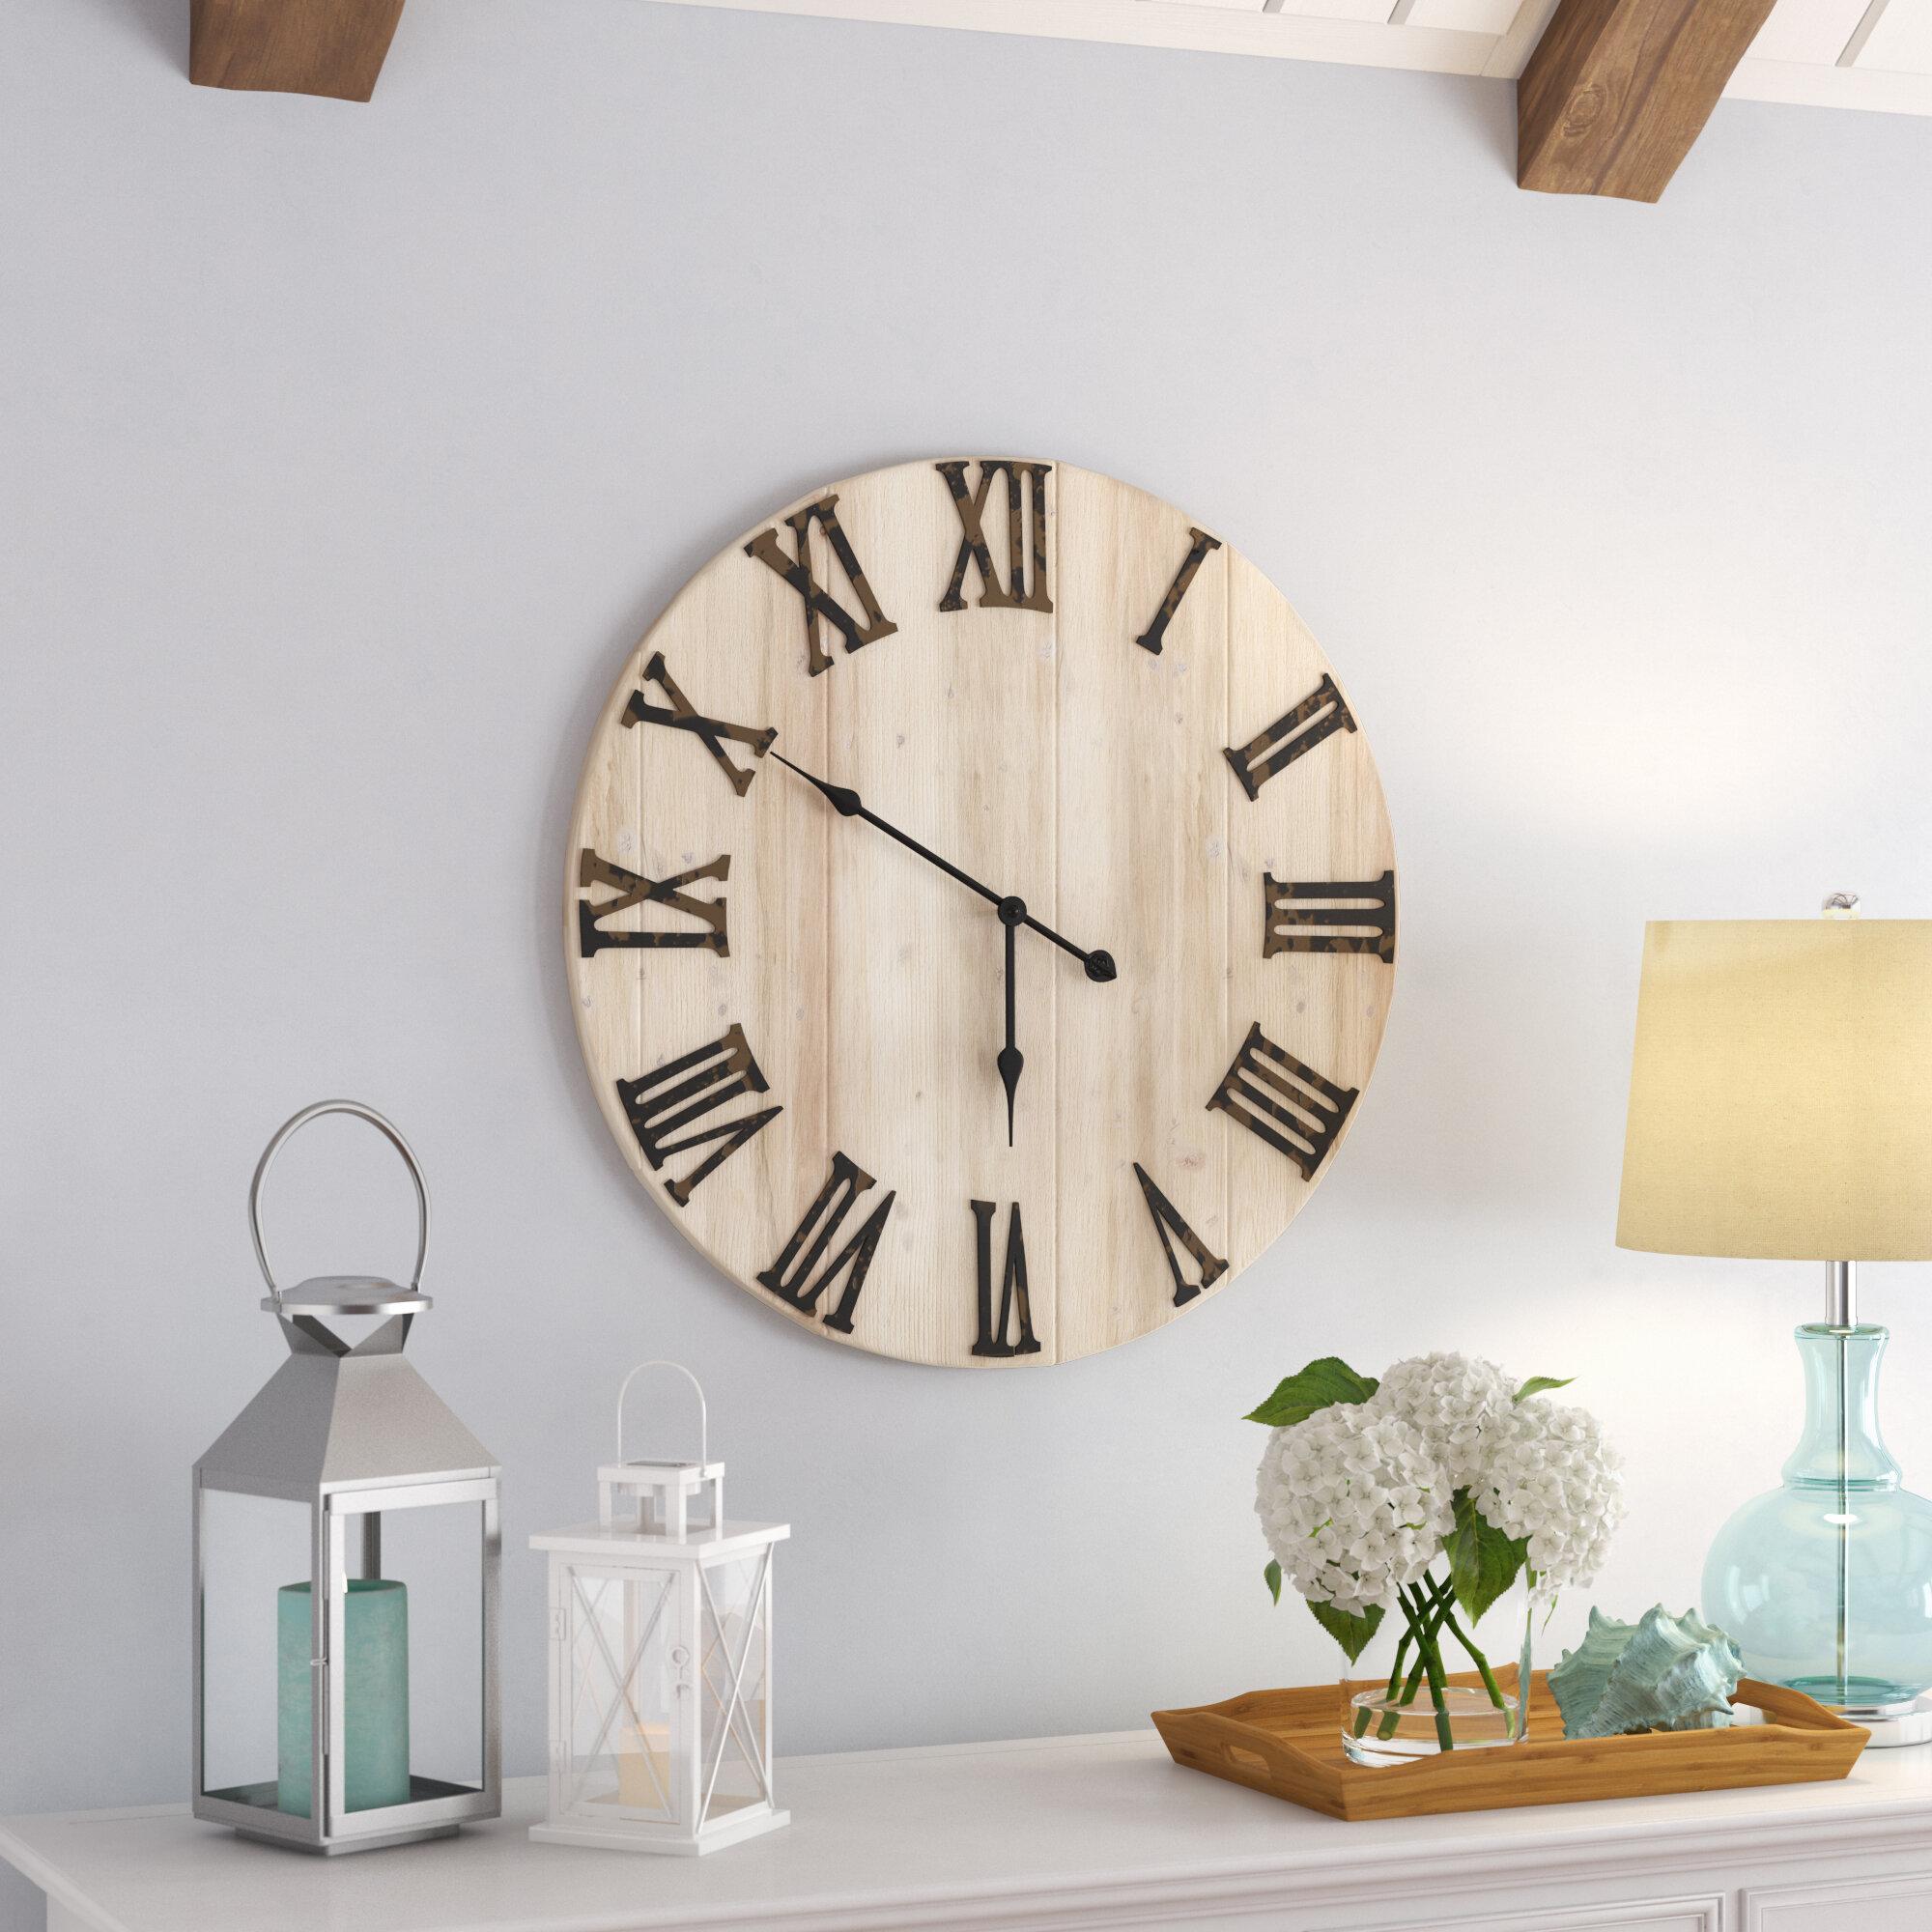 Oversized Villalobos Distressed Wood 28 Wall Clock